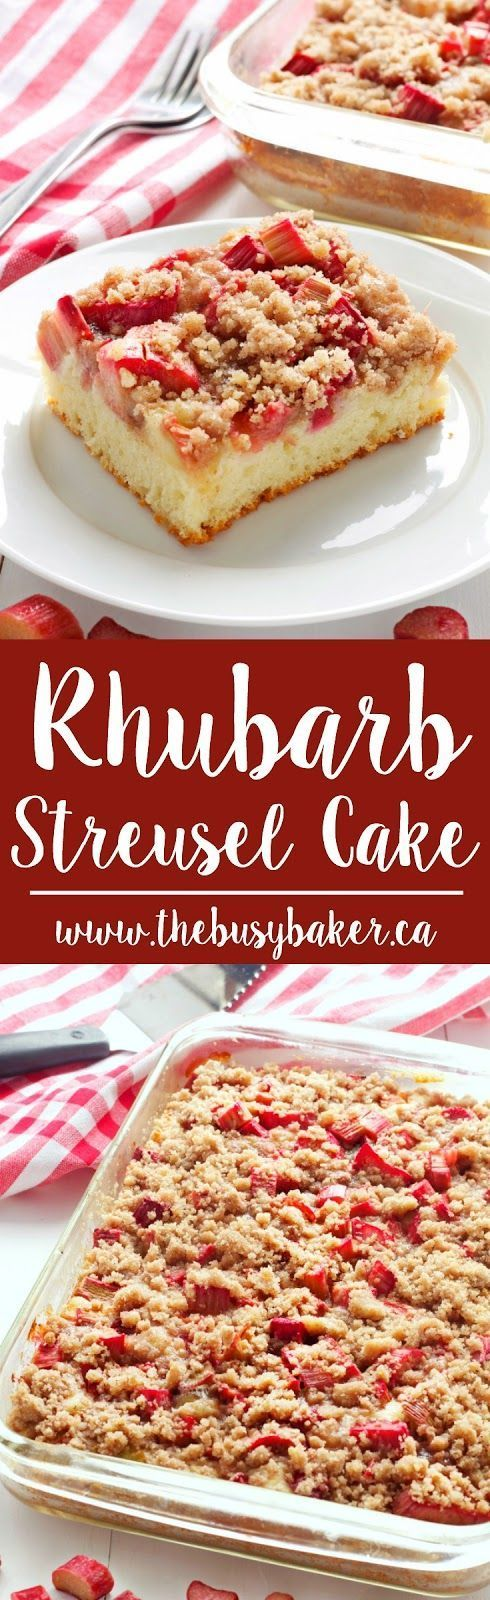 Rhubarb Streusel Cake http://www.thebusybaker.ca